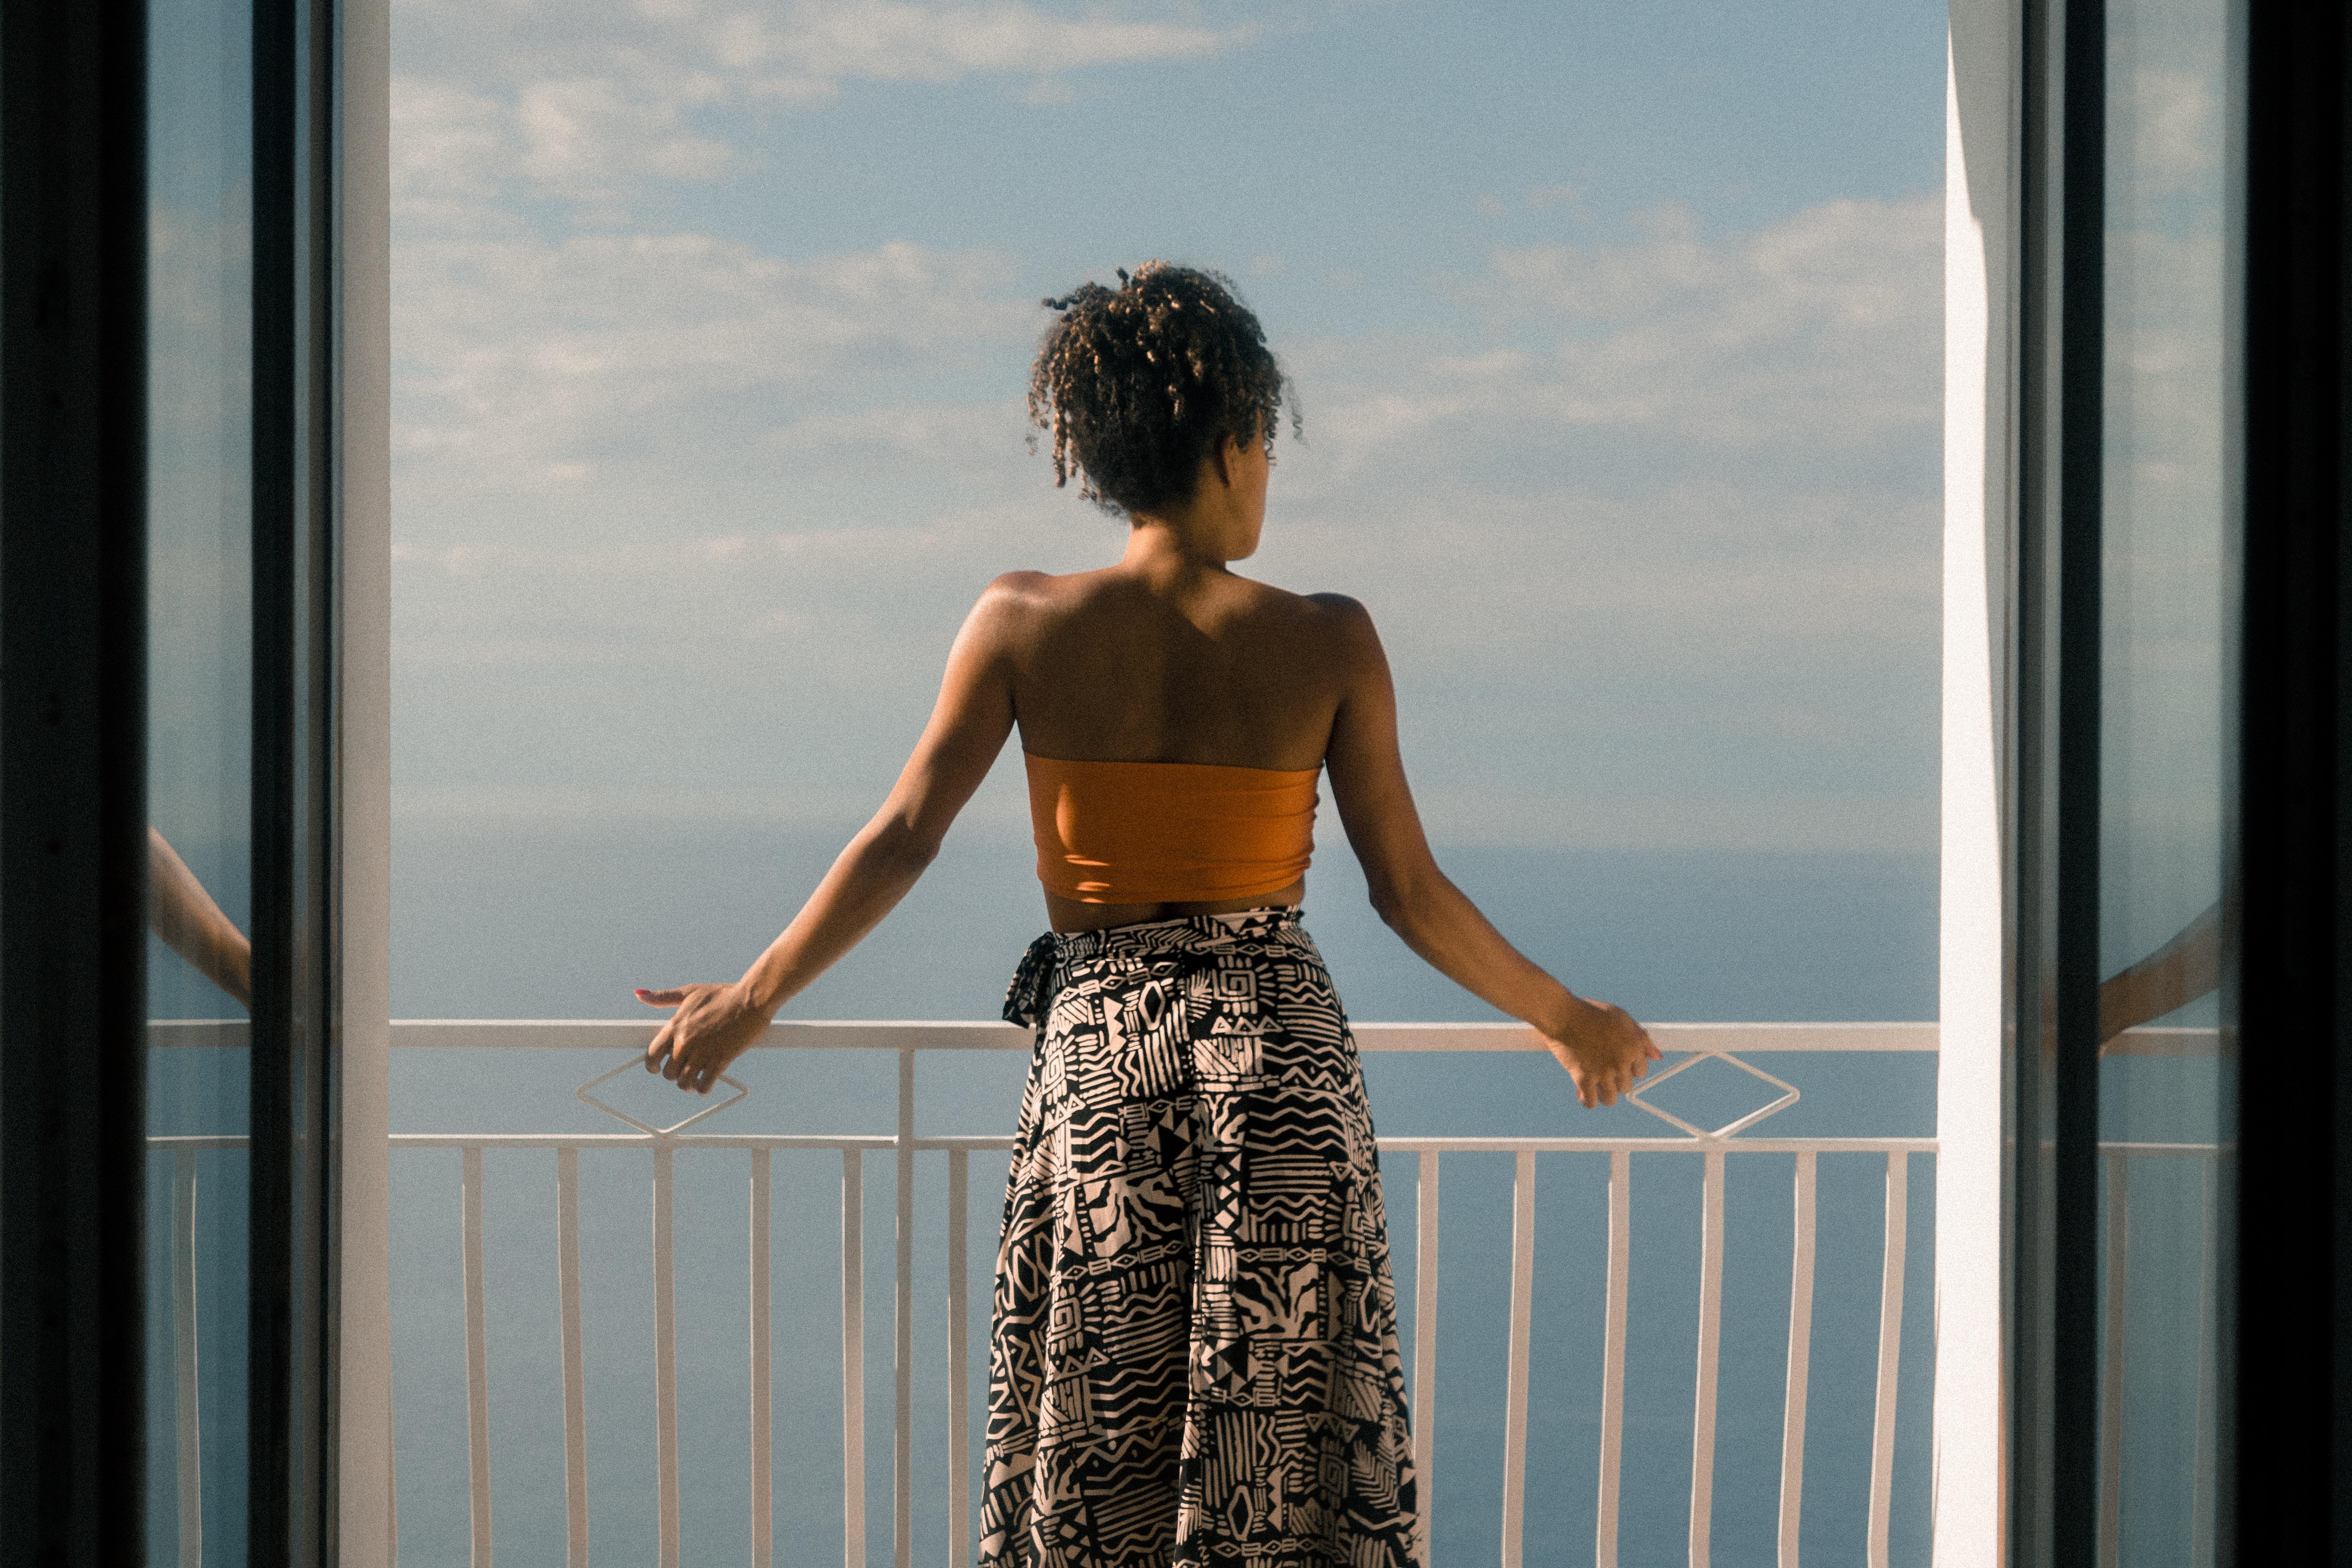 woman wearing orange tube and black skirt facing terrace